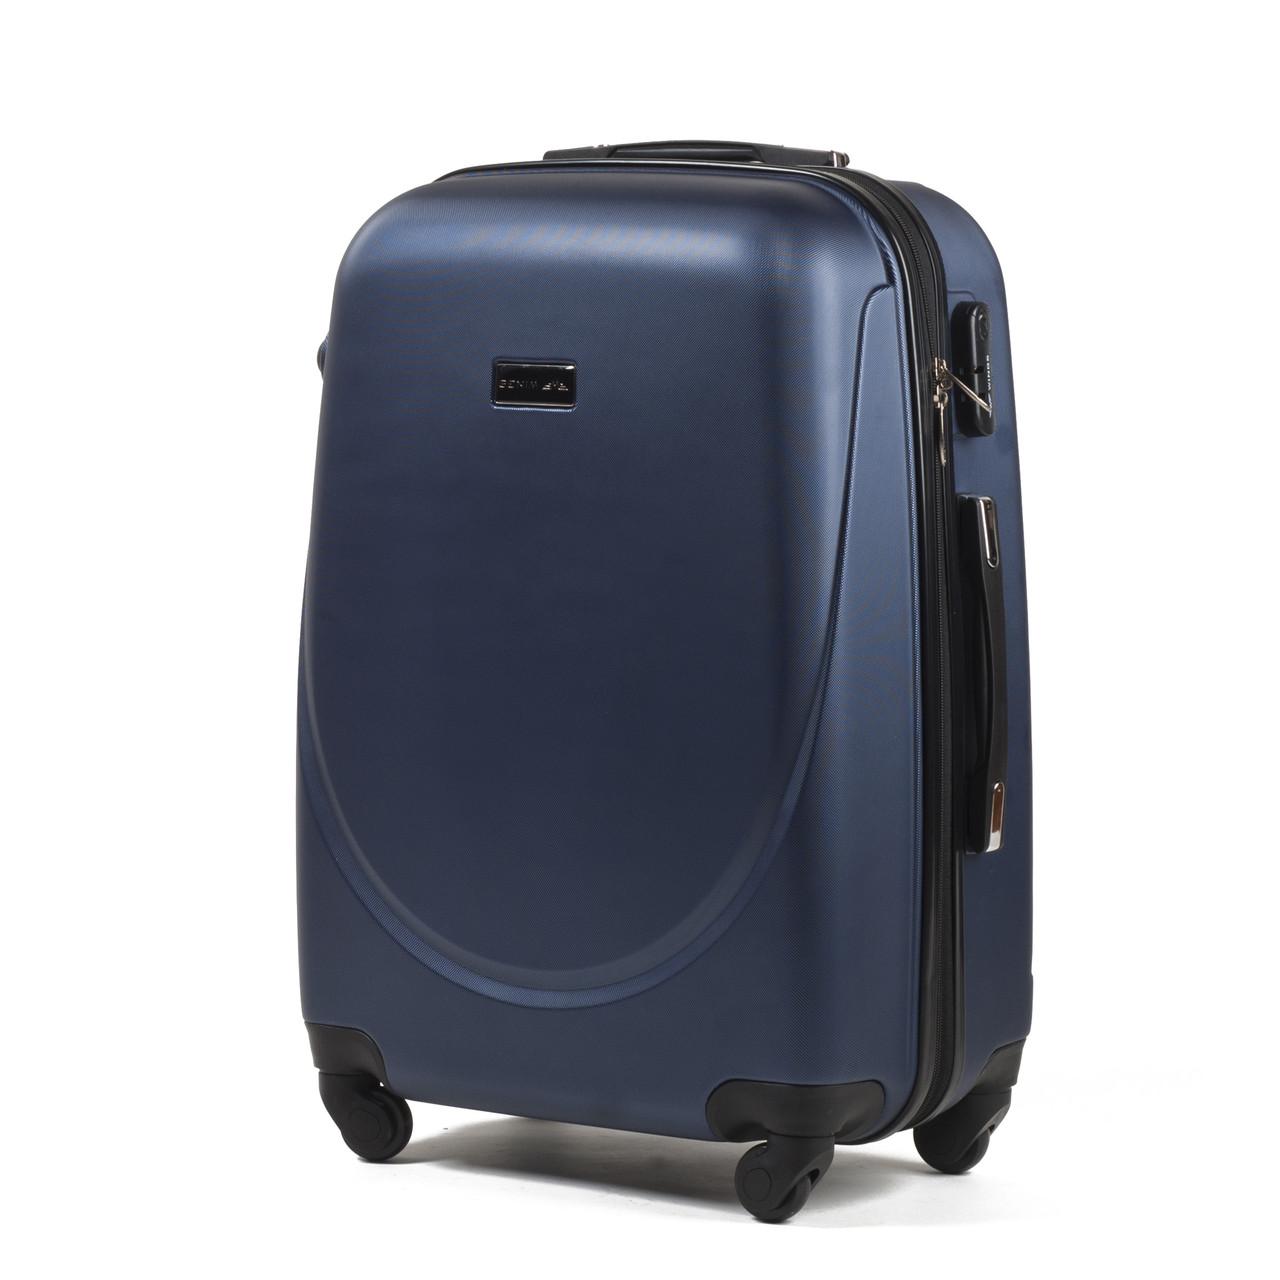 Польские чемоданы wittchen отзывы рюкзаки хамминберд miss b t20